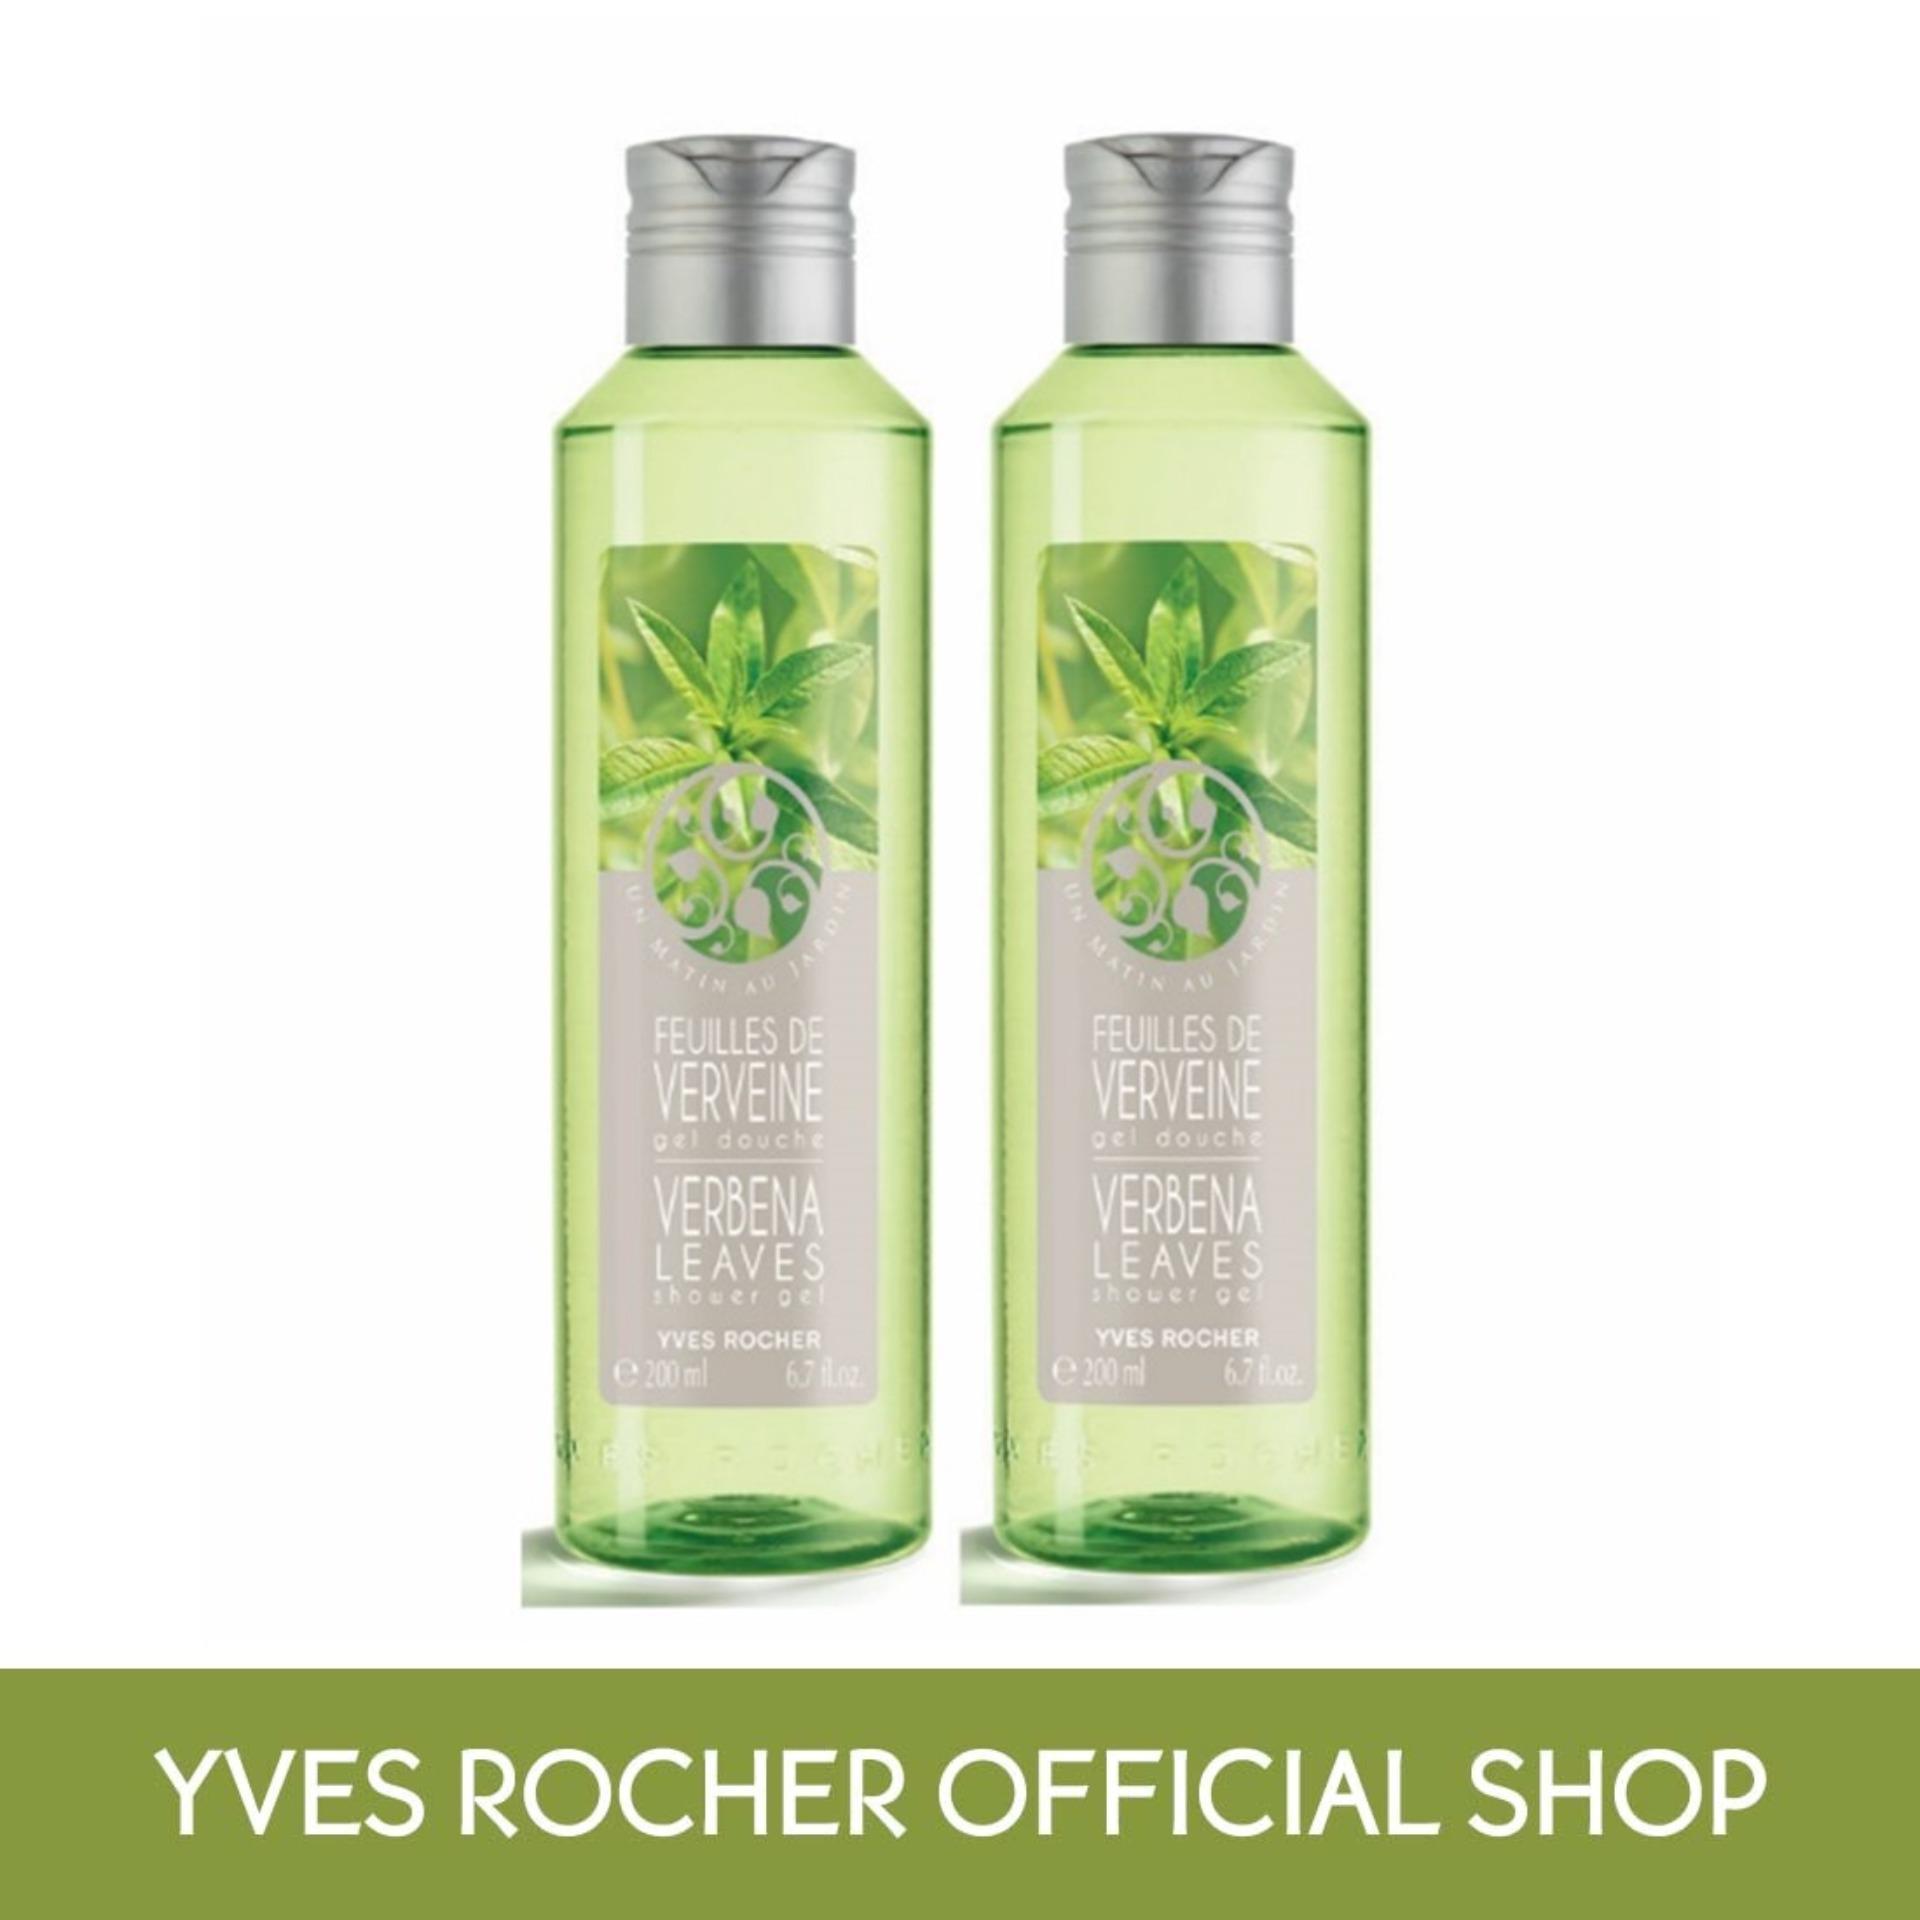 Cheapest Yves Rocher Twin Set Of Verbena Shower Gel 200Ml Online